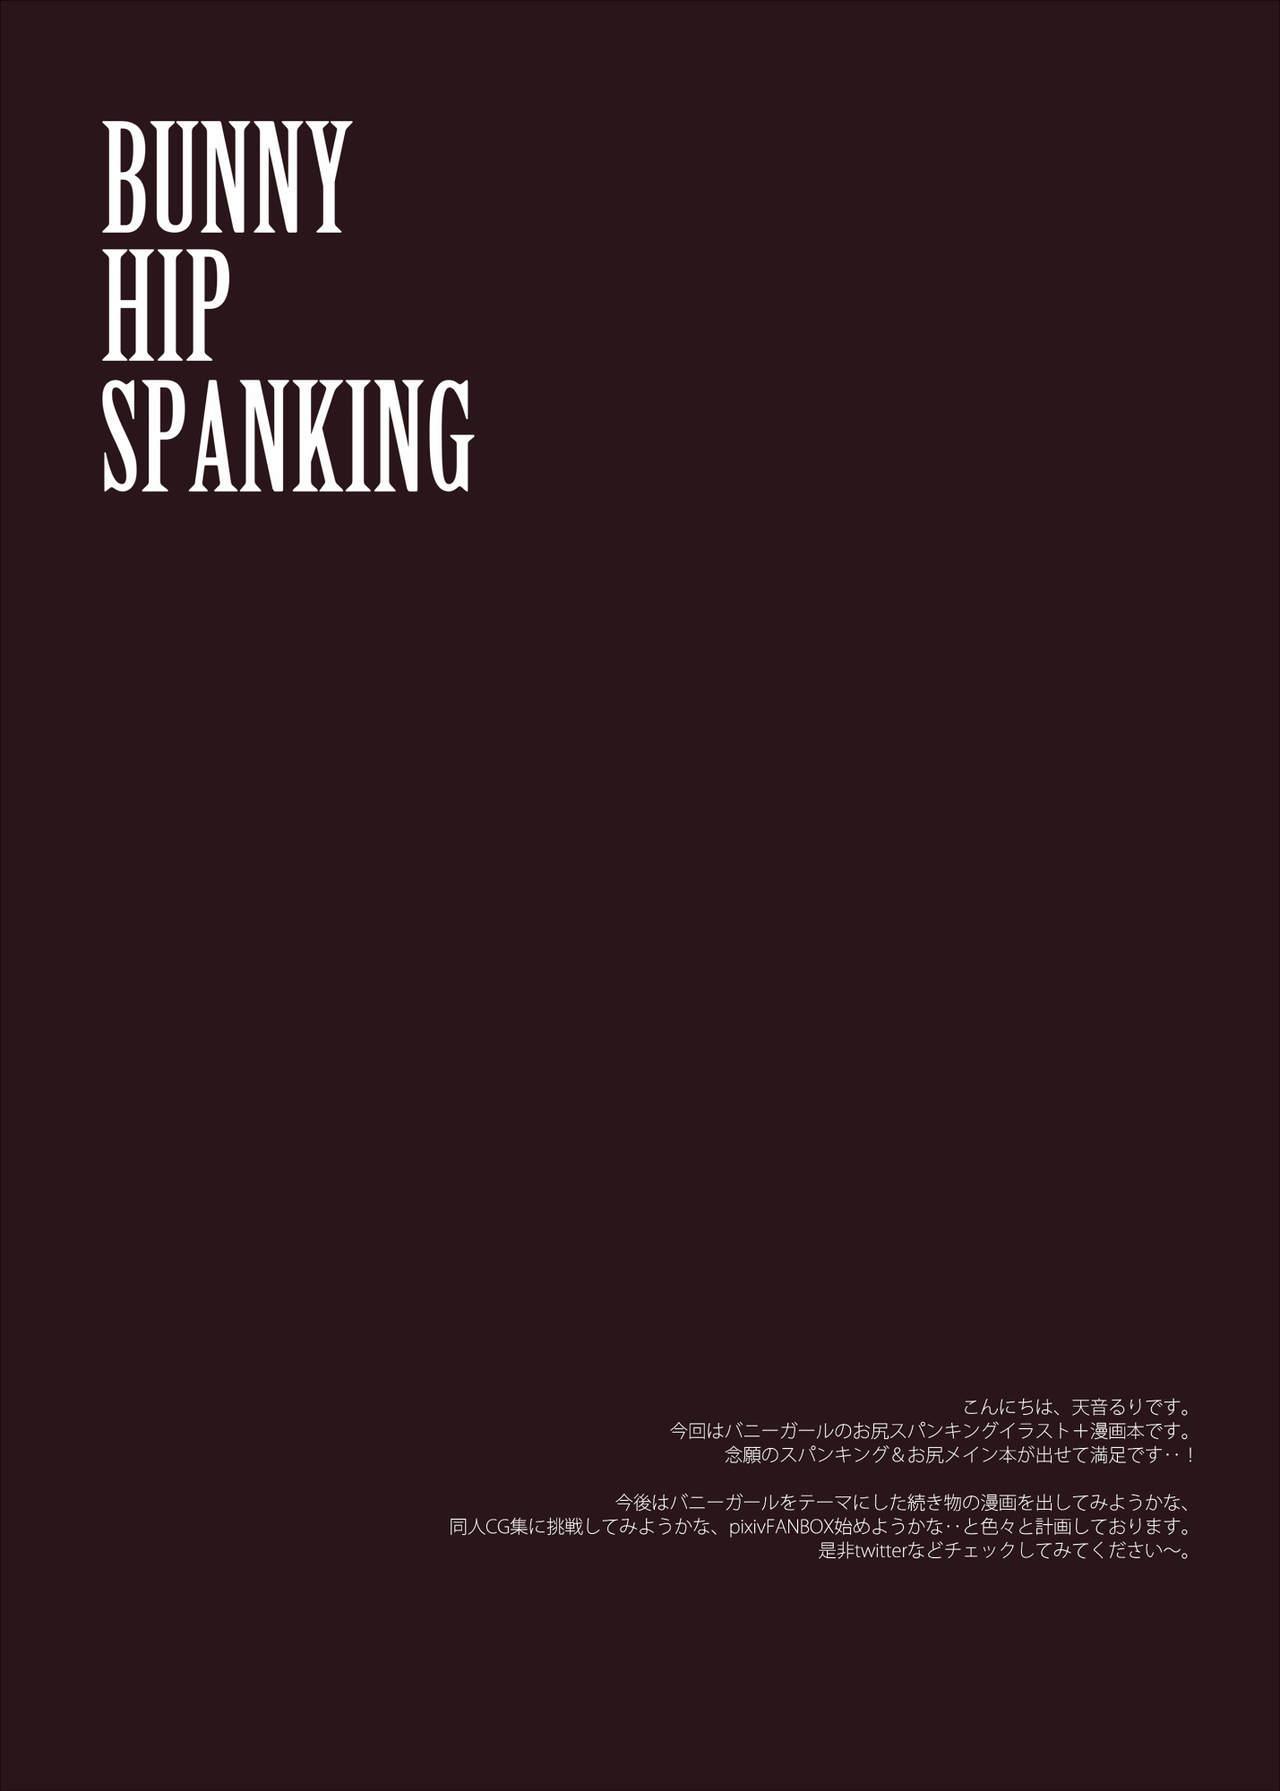 BUNNY HIP SPANKING 15